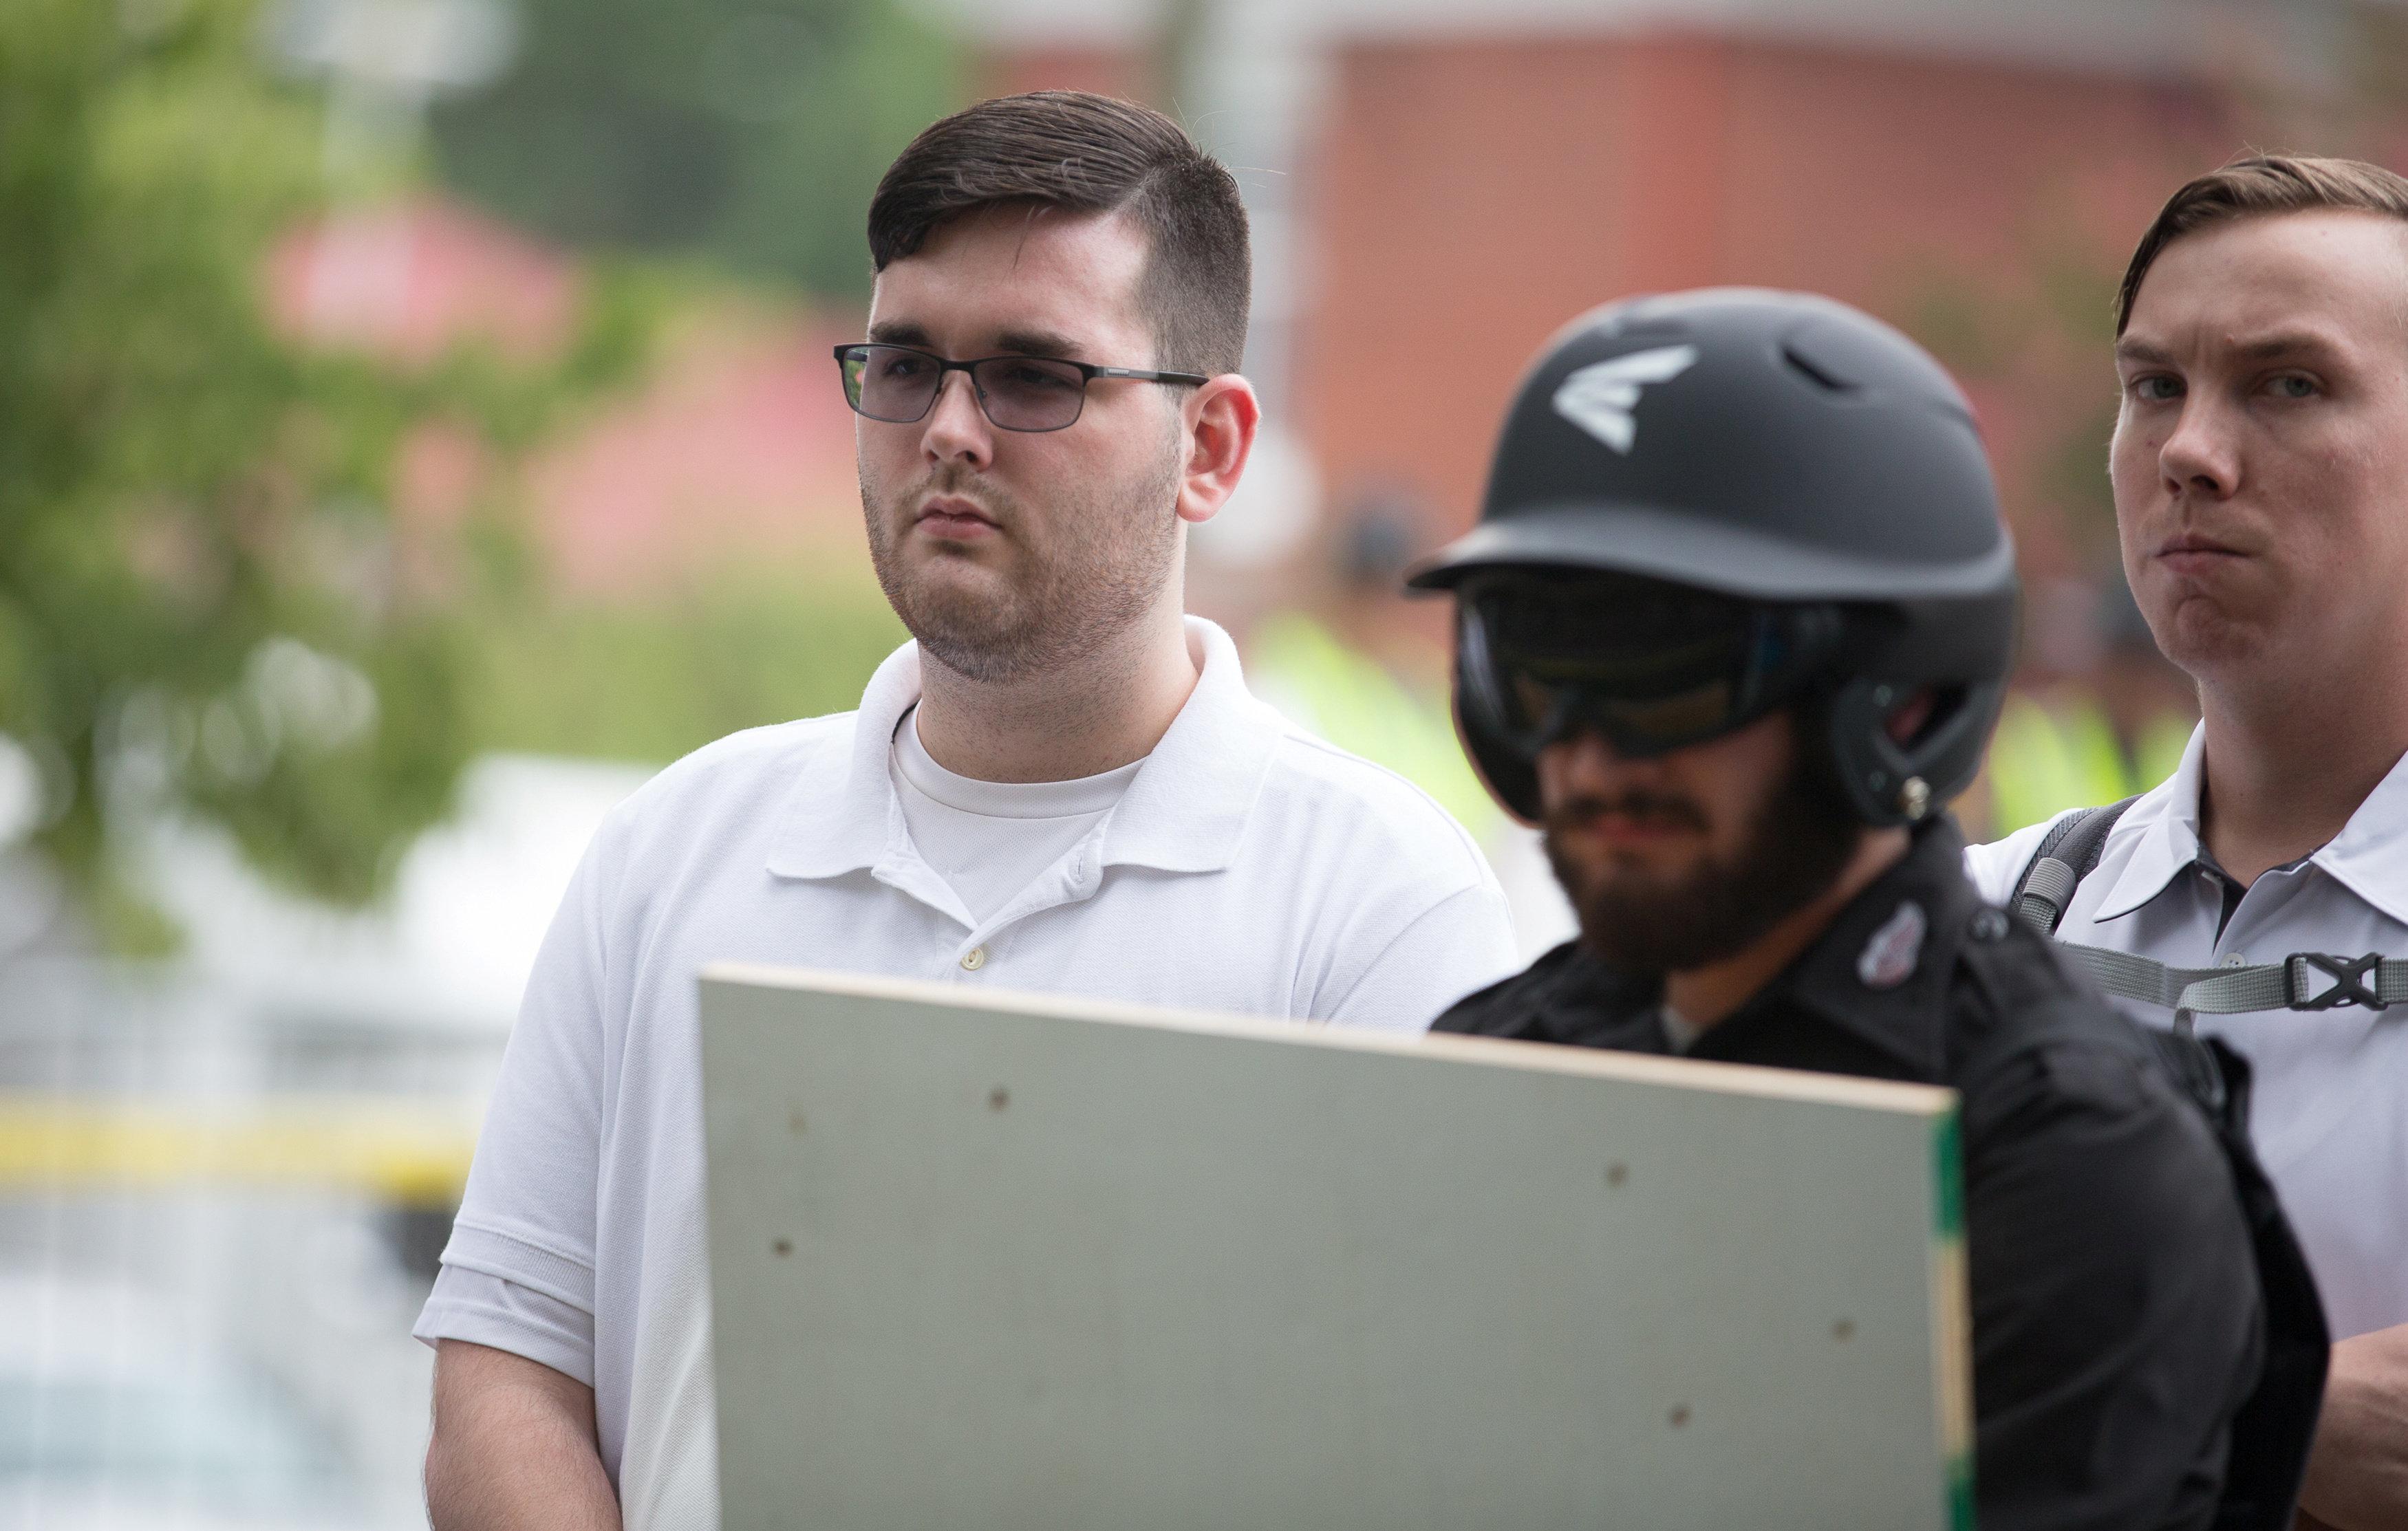 James Alex Fields, Alleged Charlottesville Attacker, Appears In